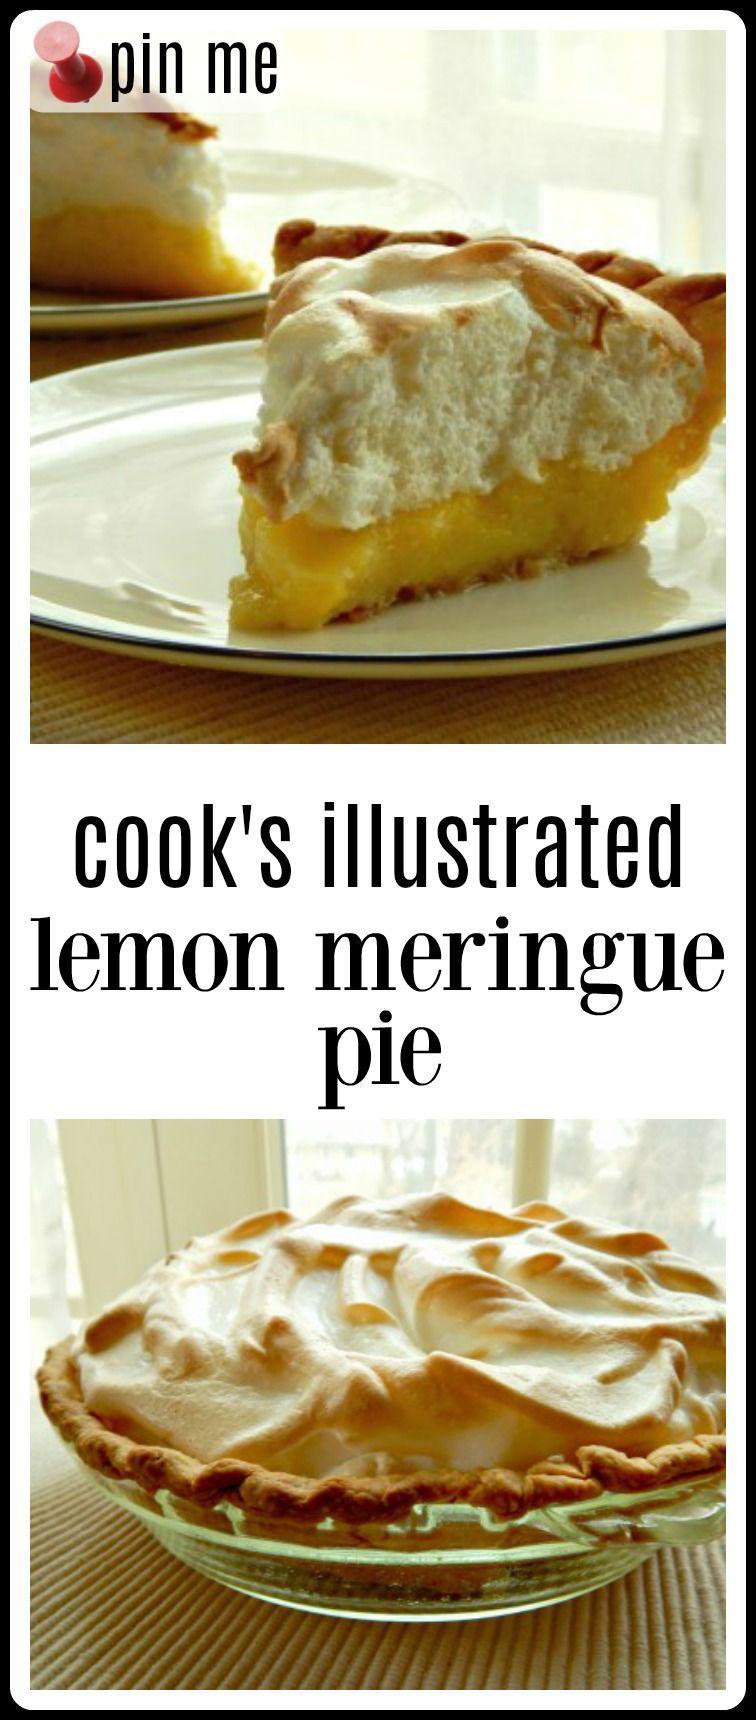 Lemon Meringue Pie - Cook's Illustrated Version #lemonmeringuepie